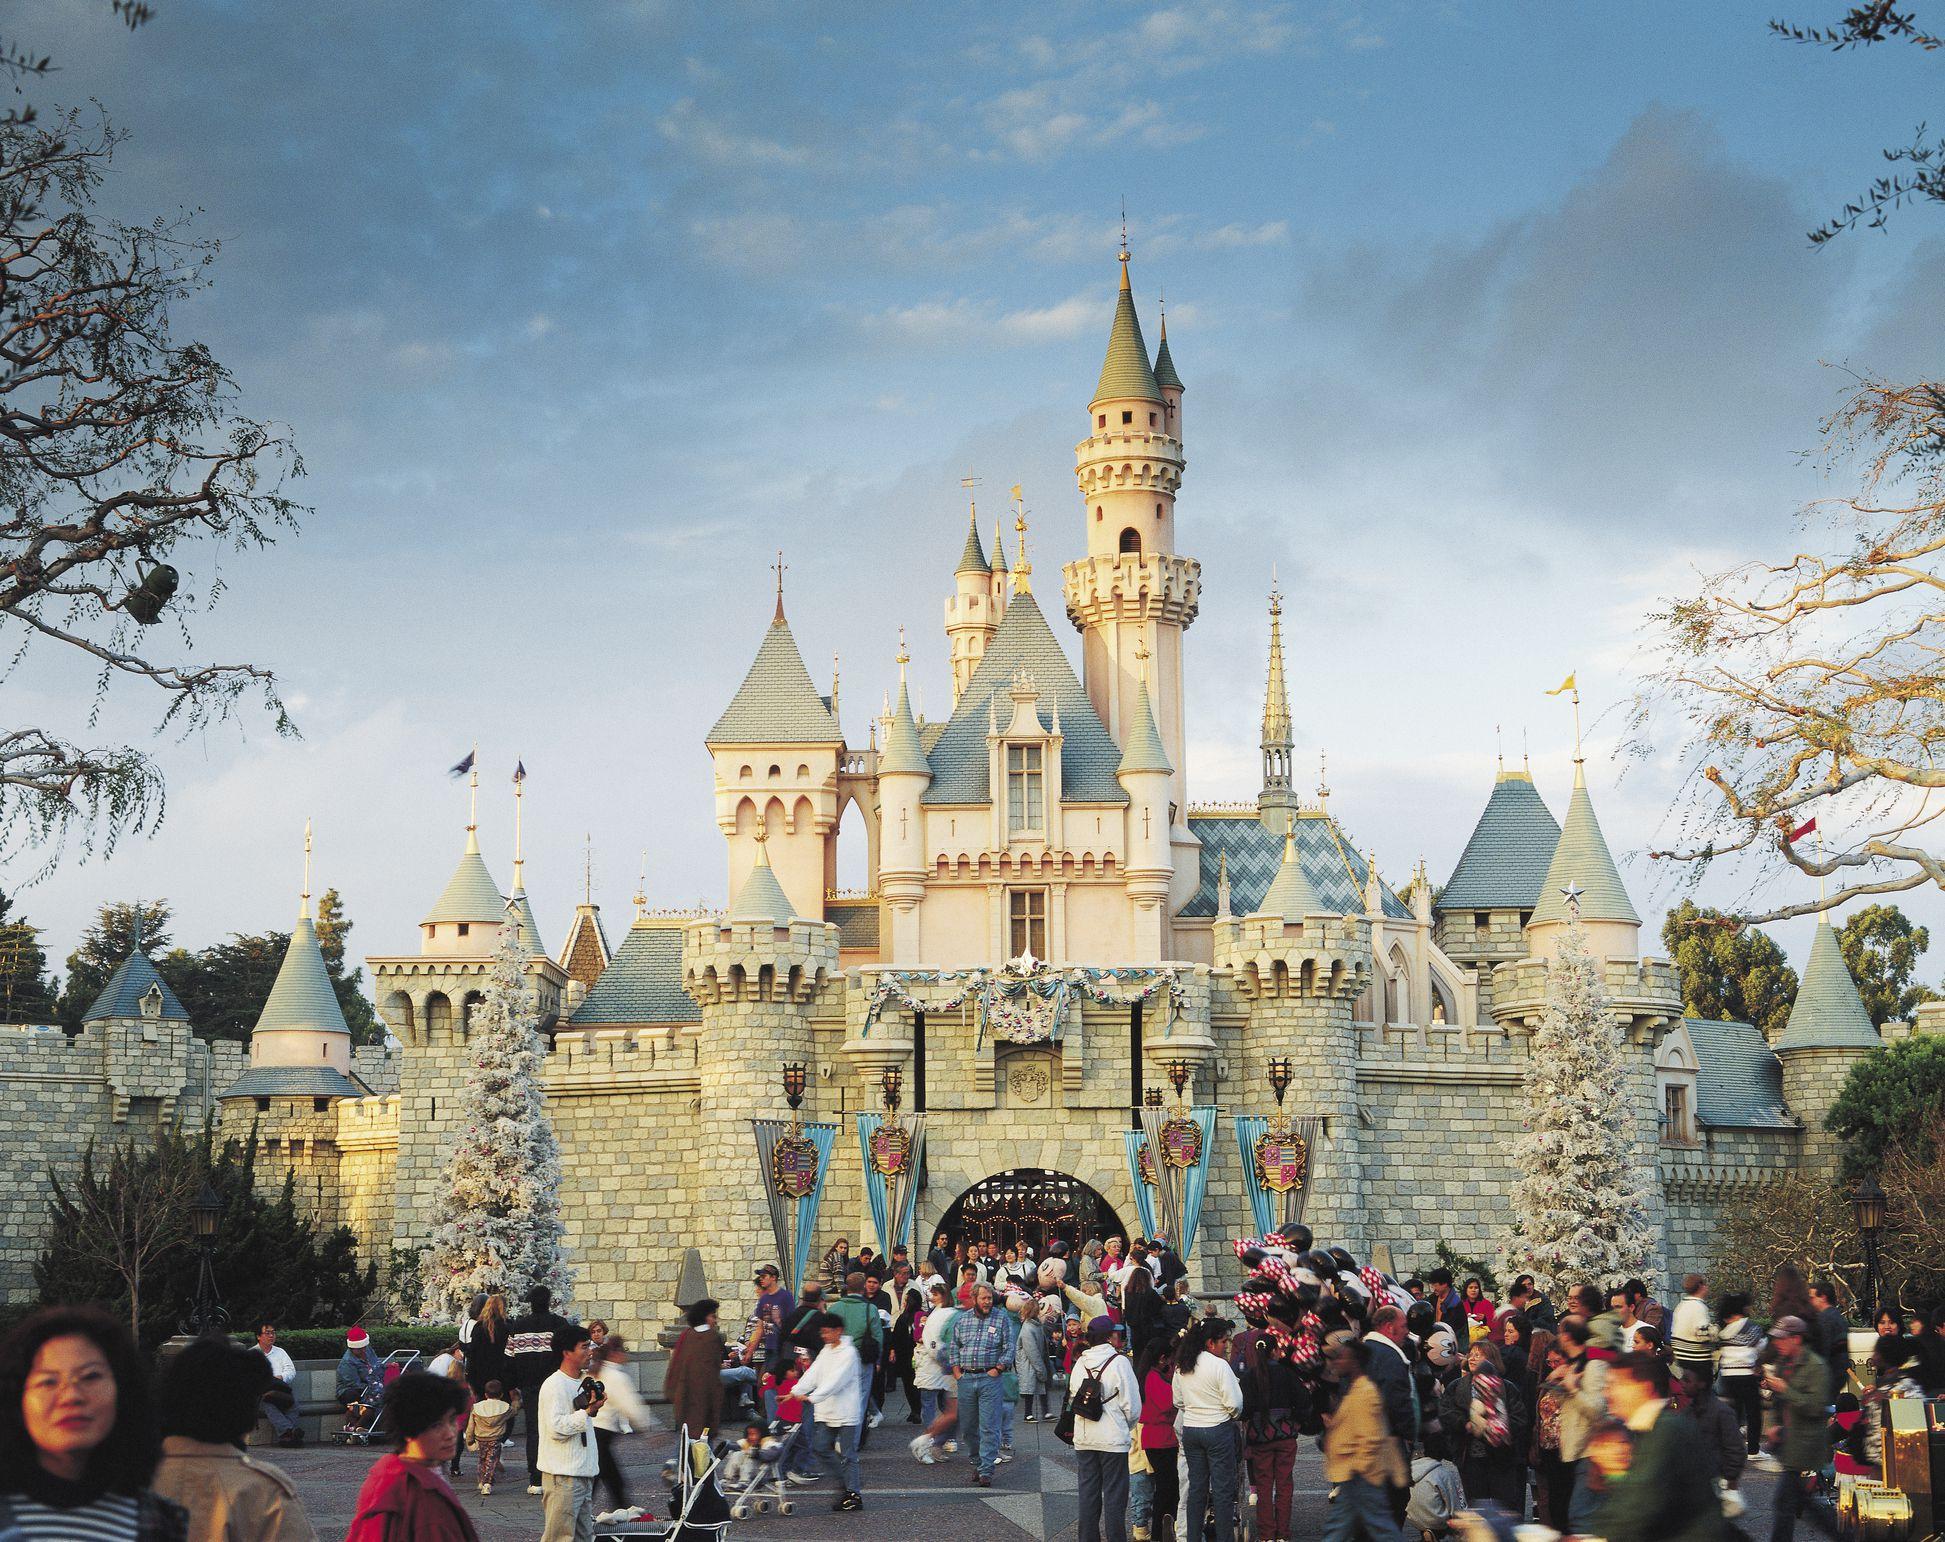 Disneyland Discount Tickets Cheap Ways To Buy Them